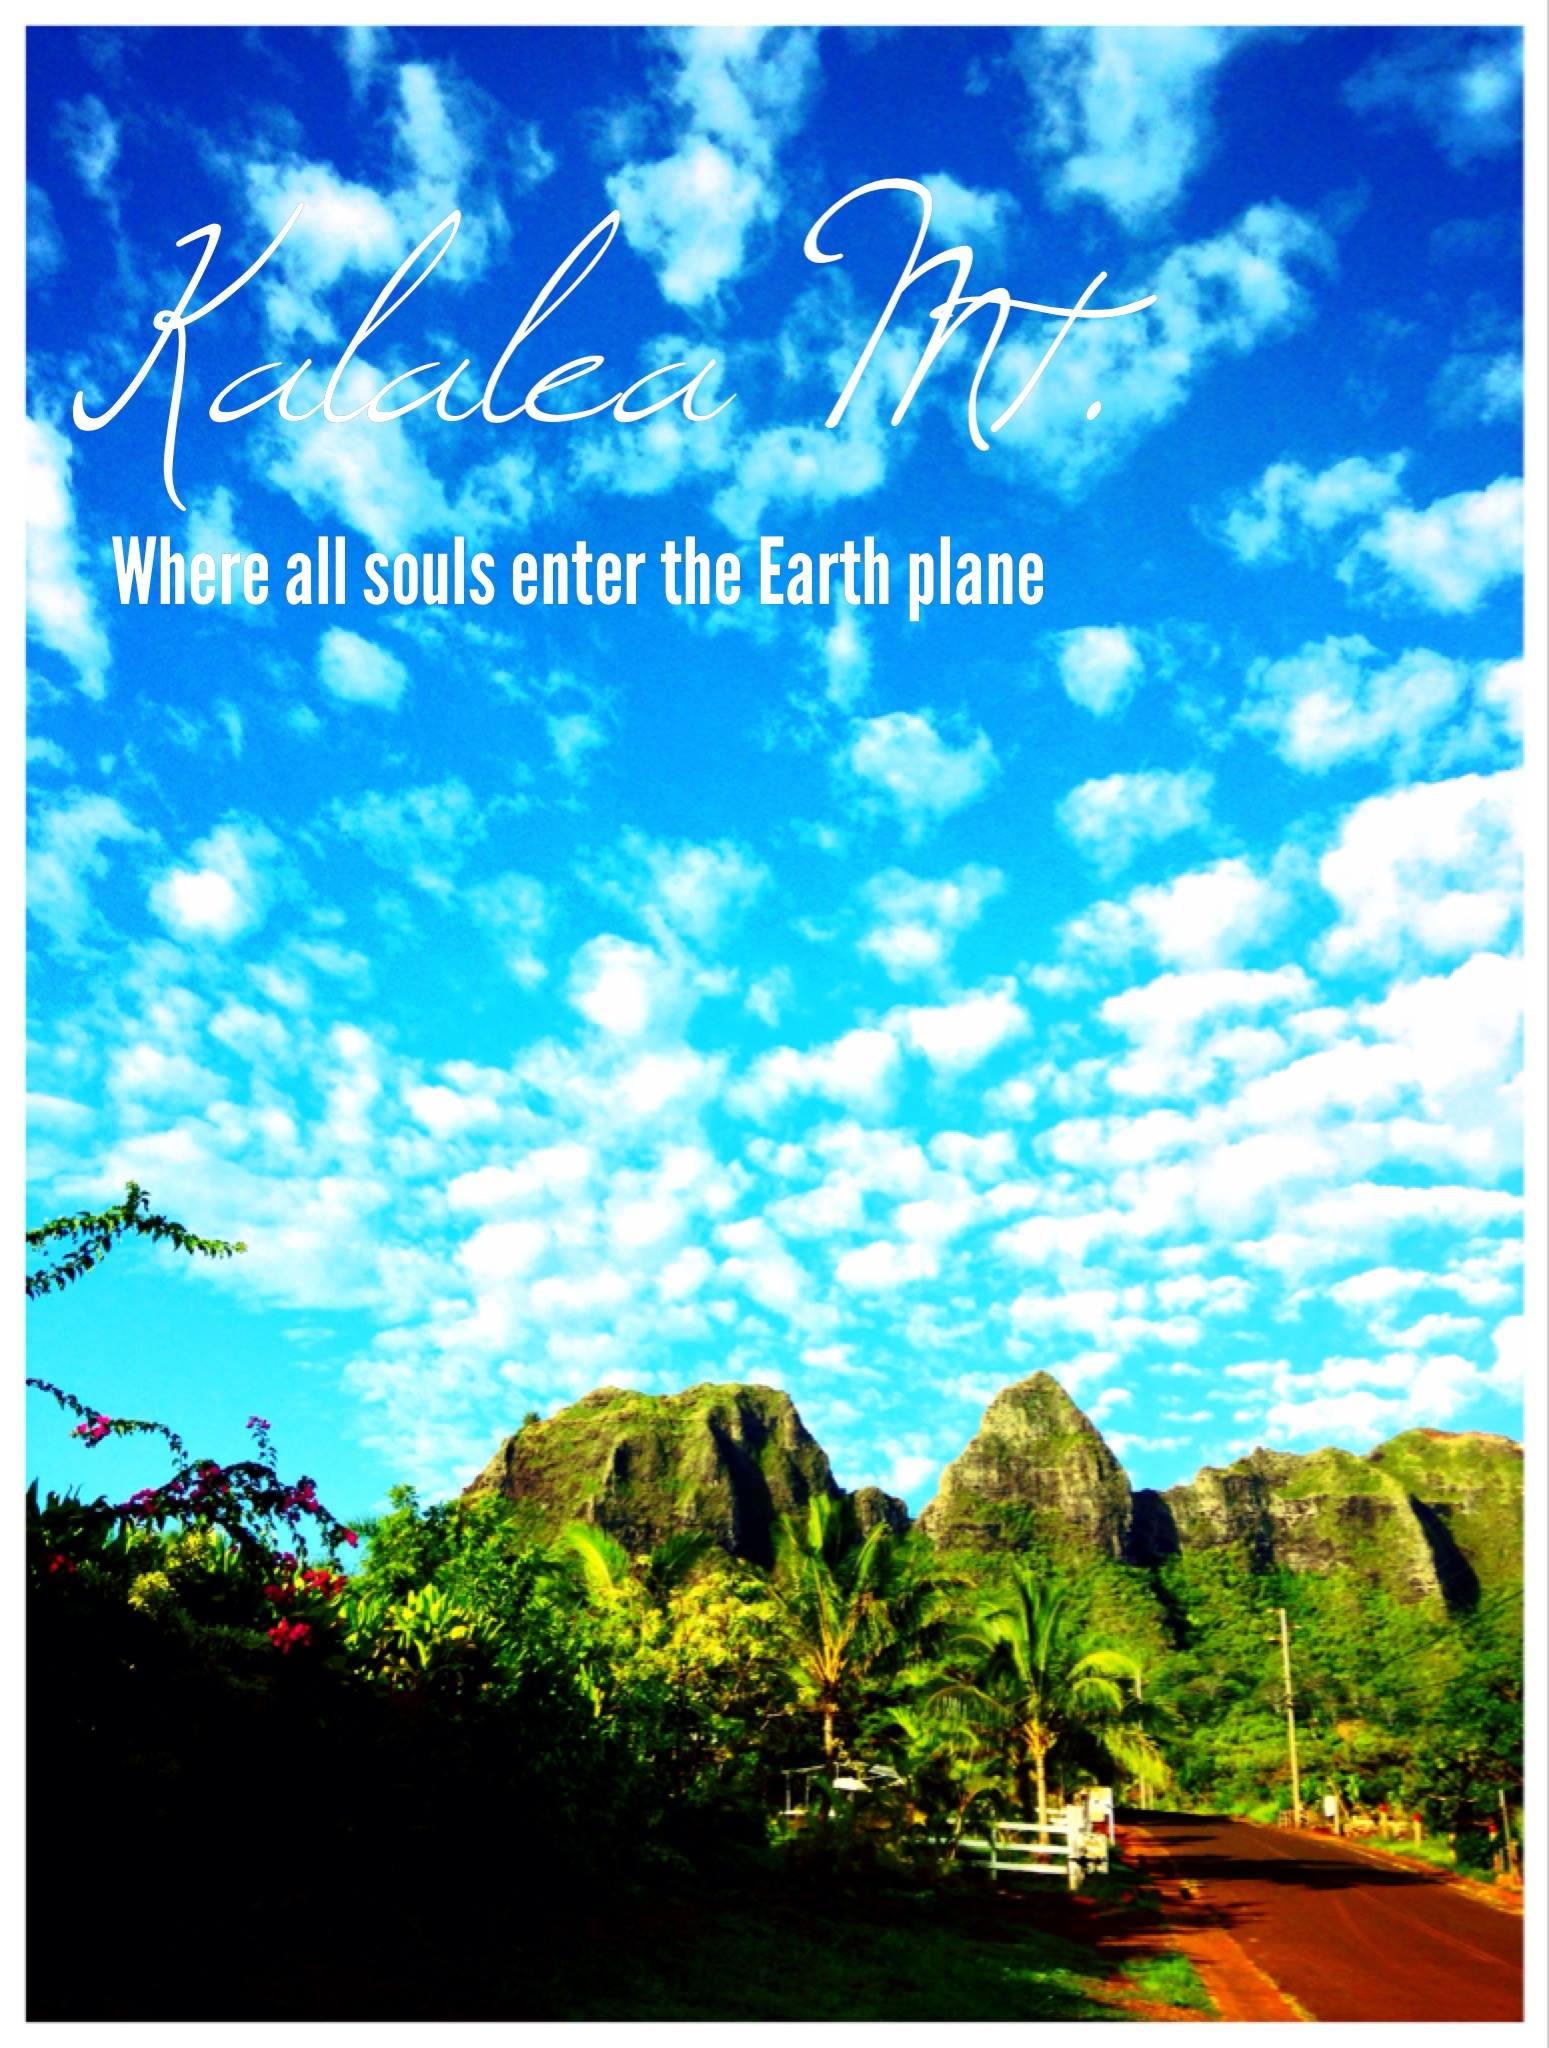 Kalalea Mt., Anahola, Kauai, Hawaii